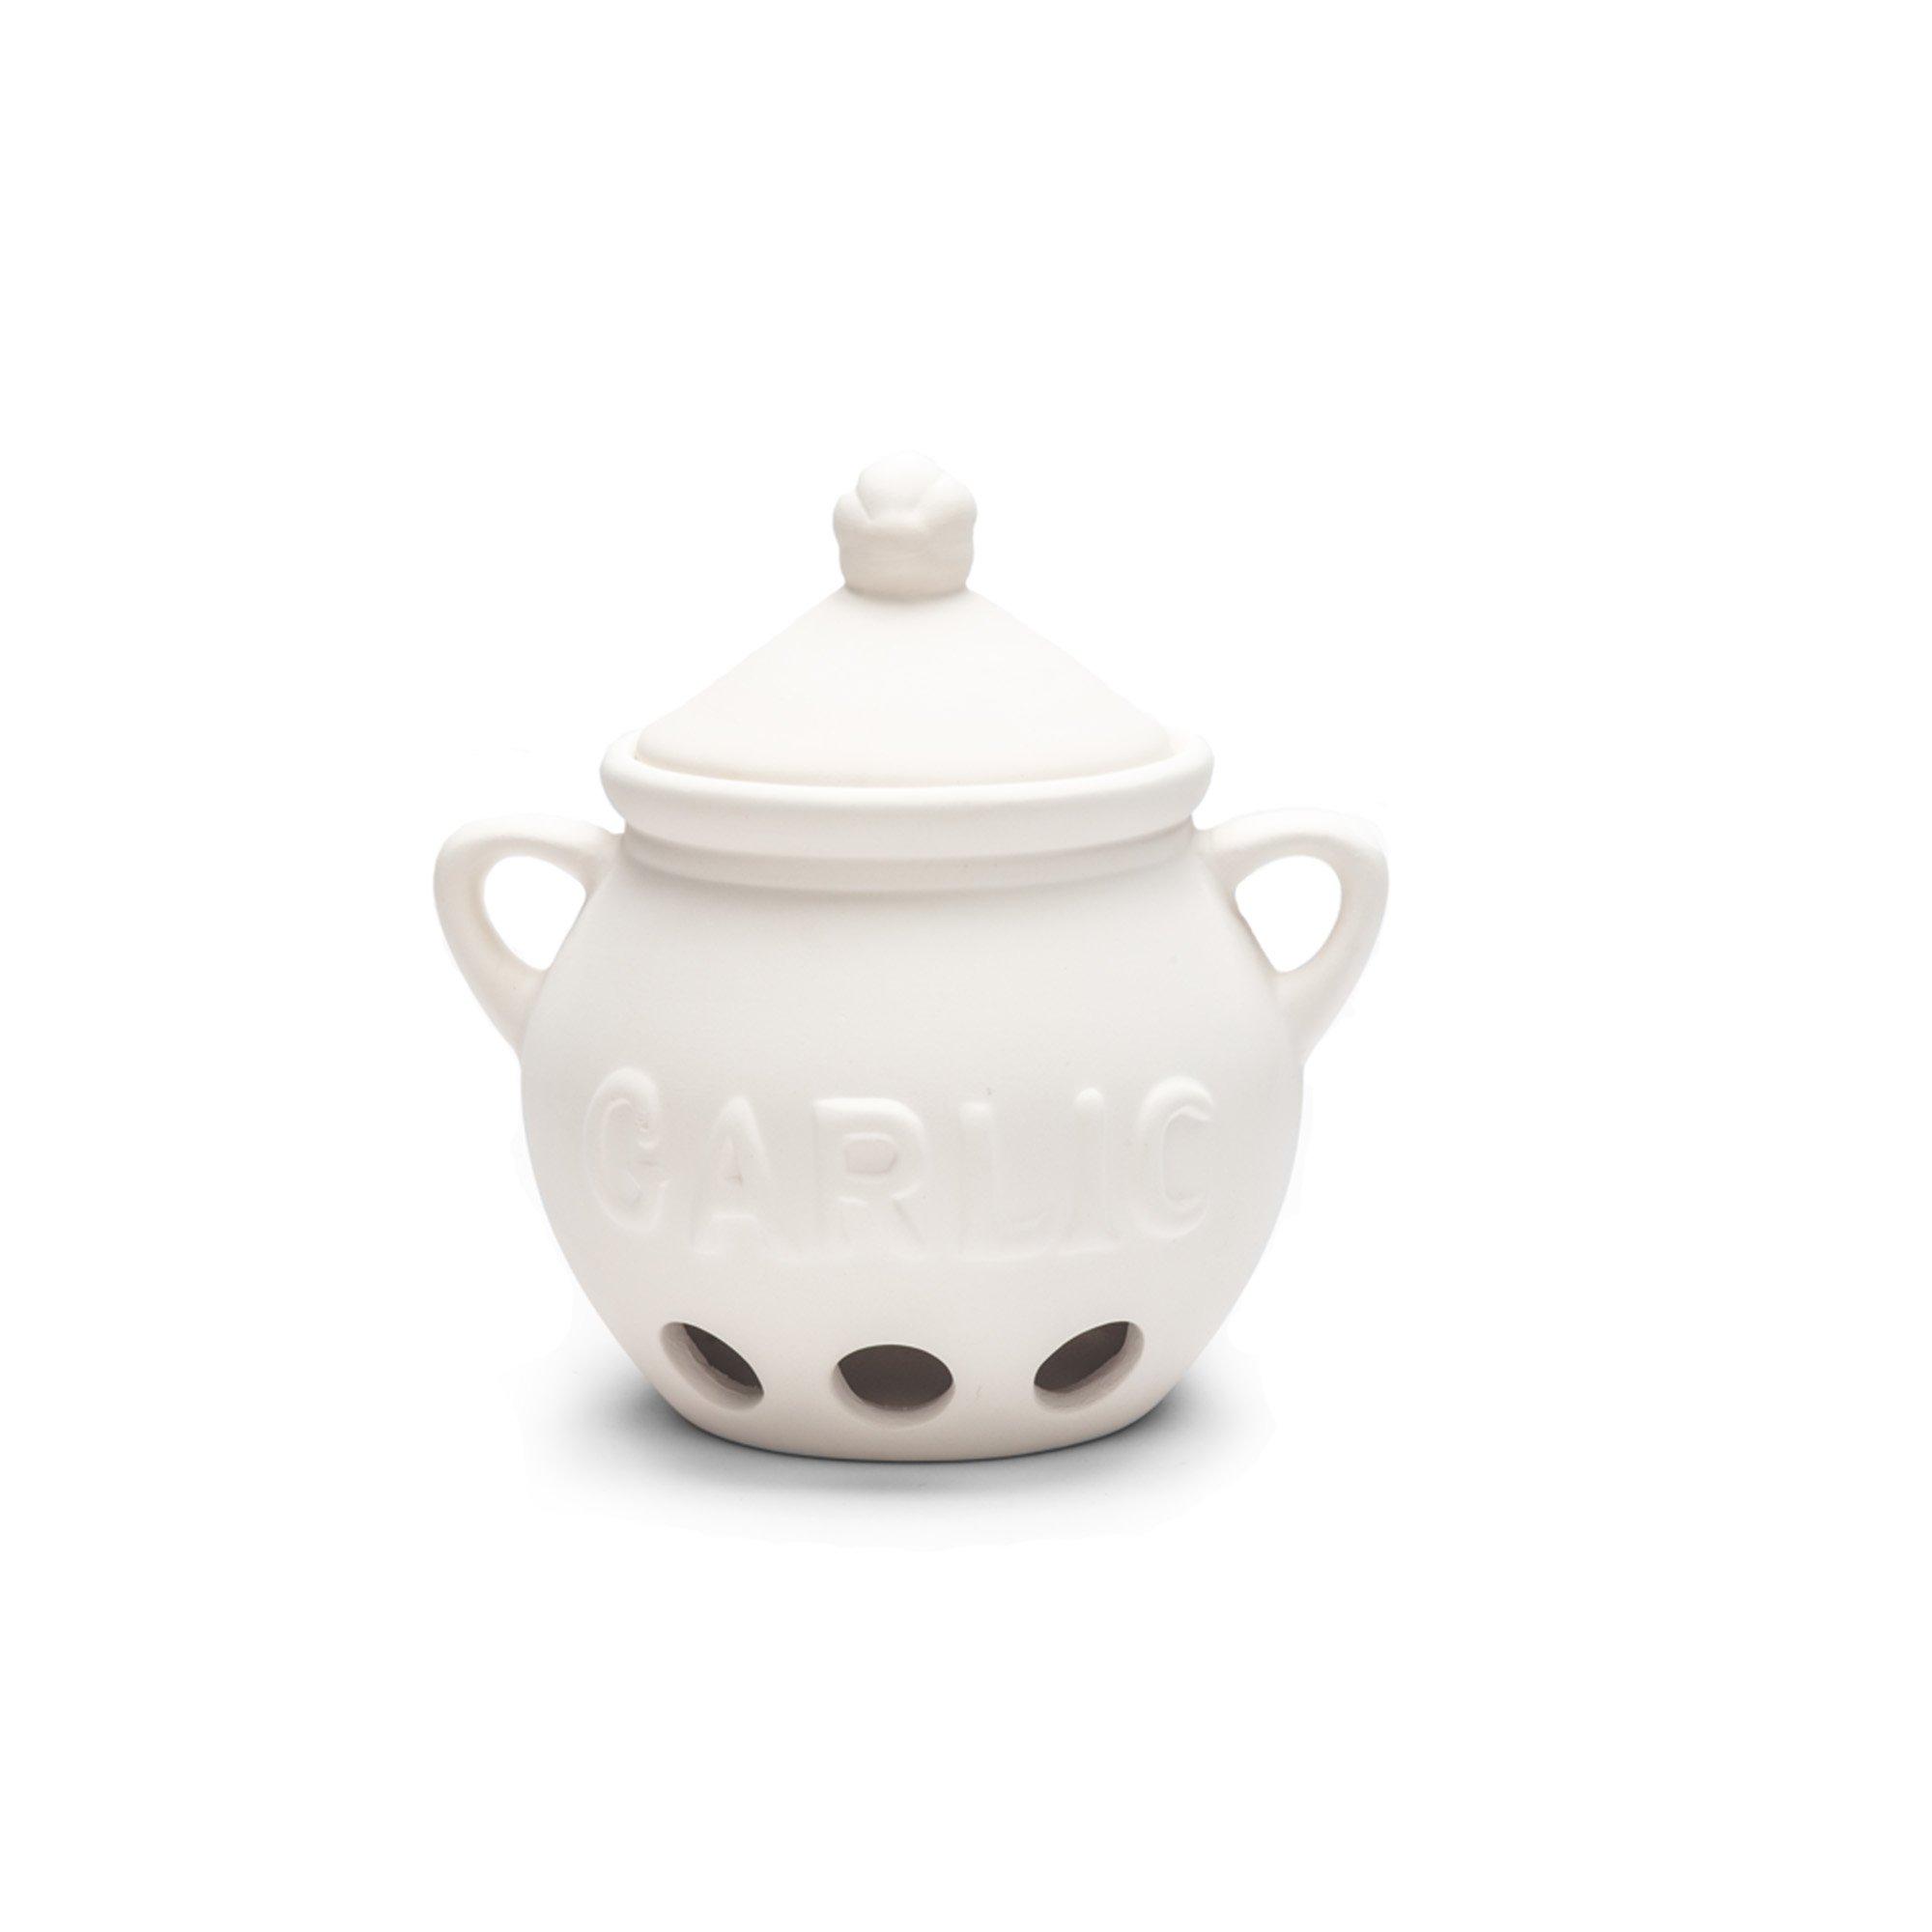 Fox Run 3971 Garlic Keeper, Ceramic, White